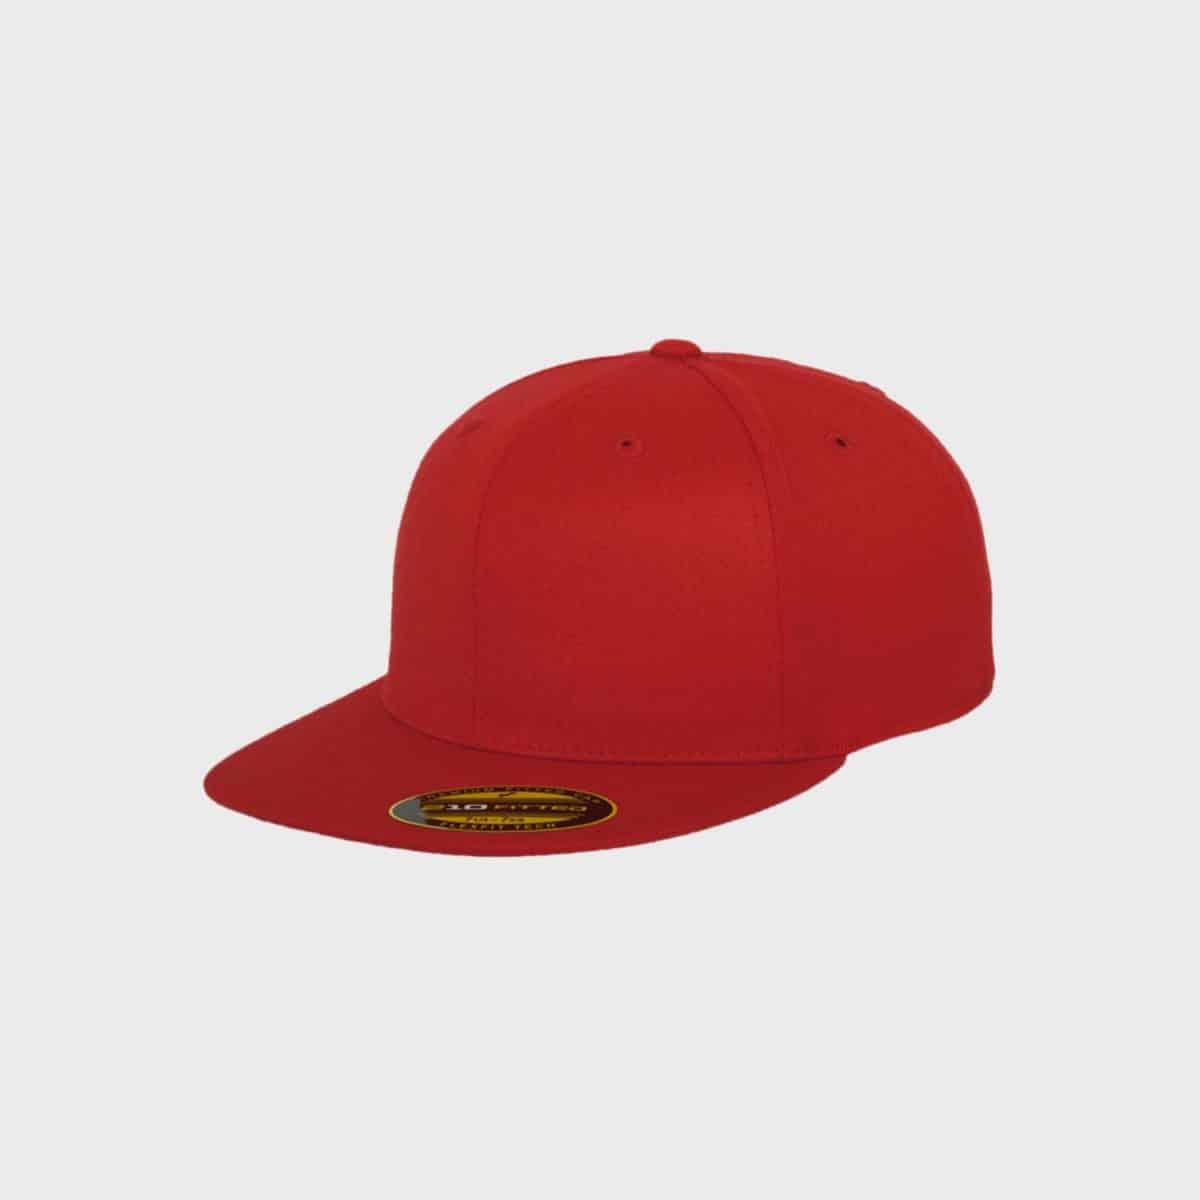 Flexfit FlexfitCaps FFE 6210 Red Front Side